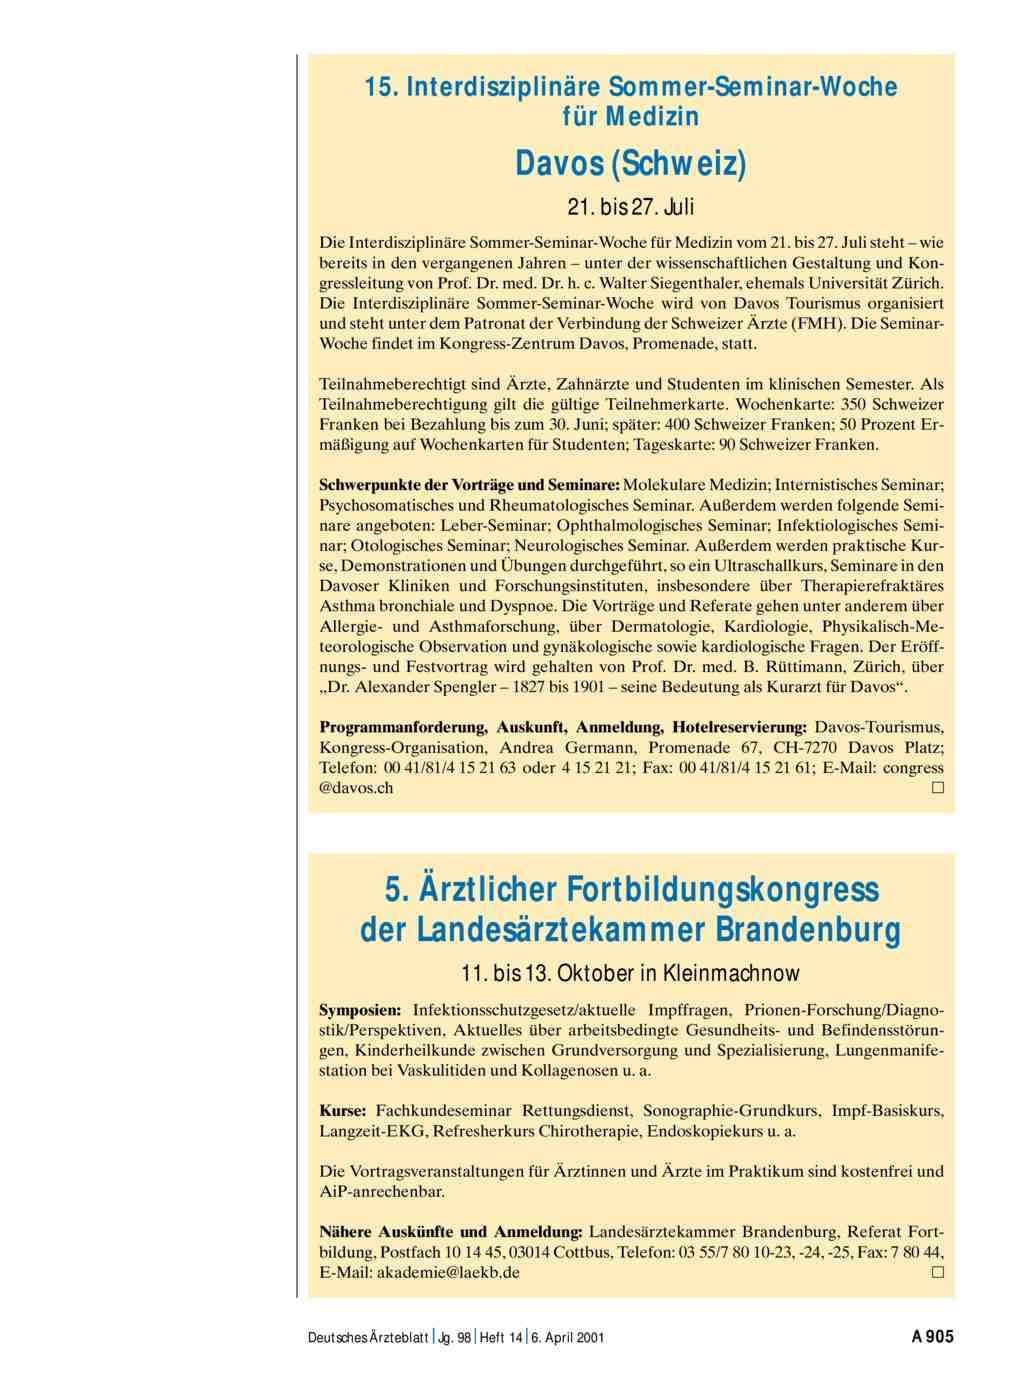 15 interdisziplin re sommer seminar woche f r medizin for Medizin studieren schweiz